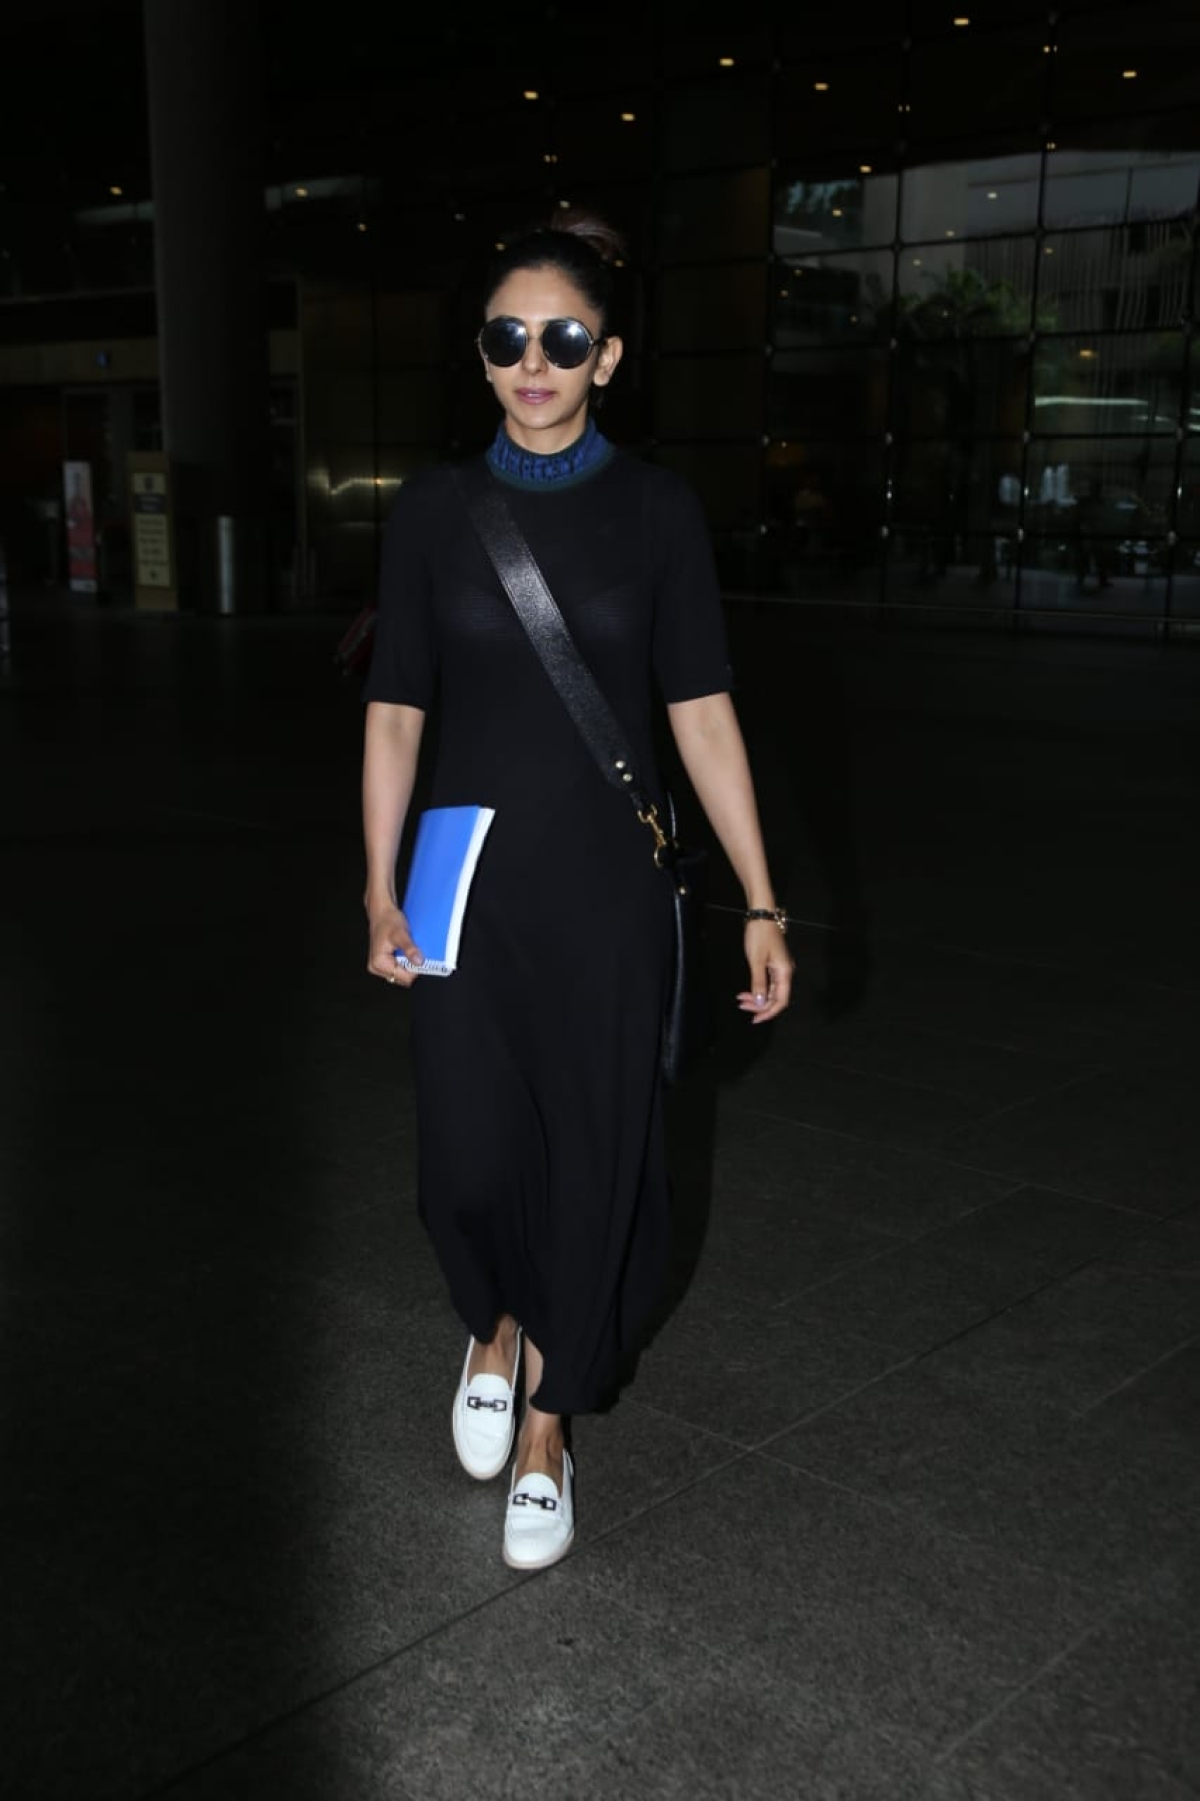 'De De Pyaar De' actress Rakul Preet Singh was seen at Mumbai airport earlier today.